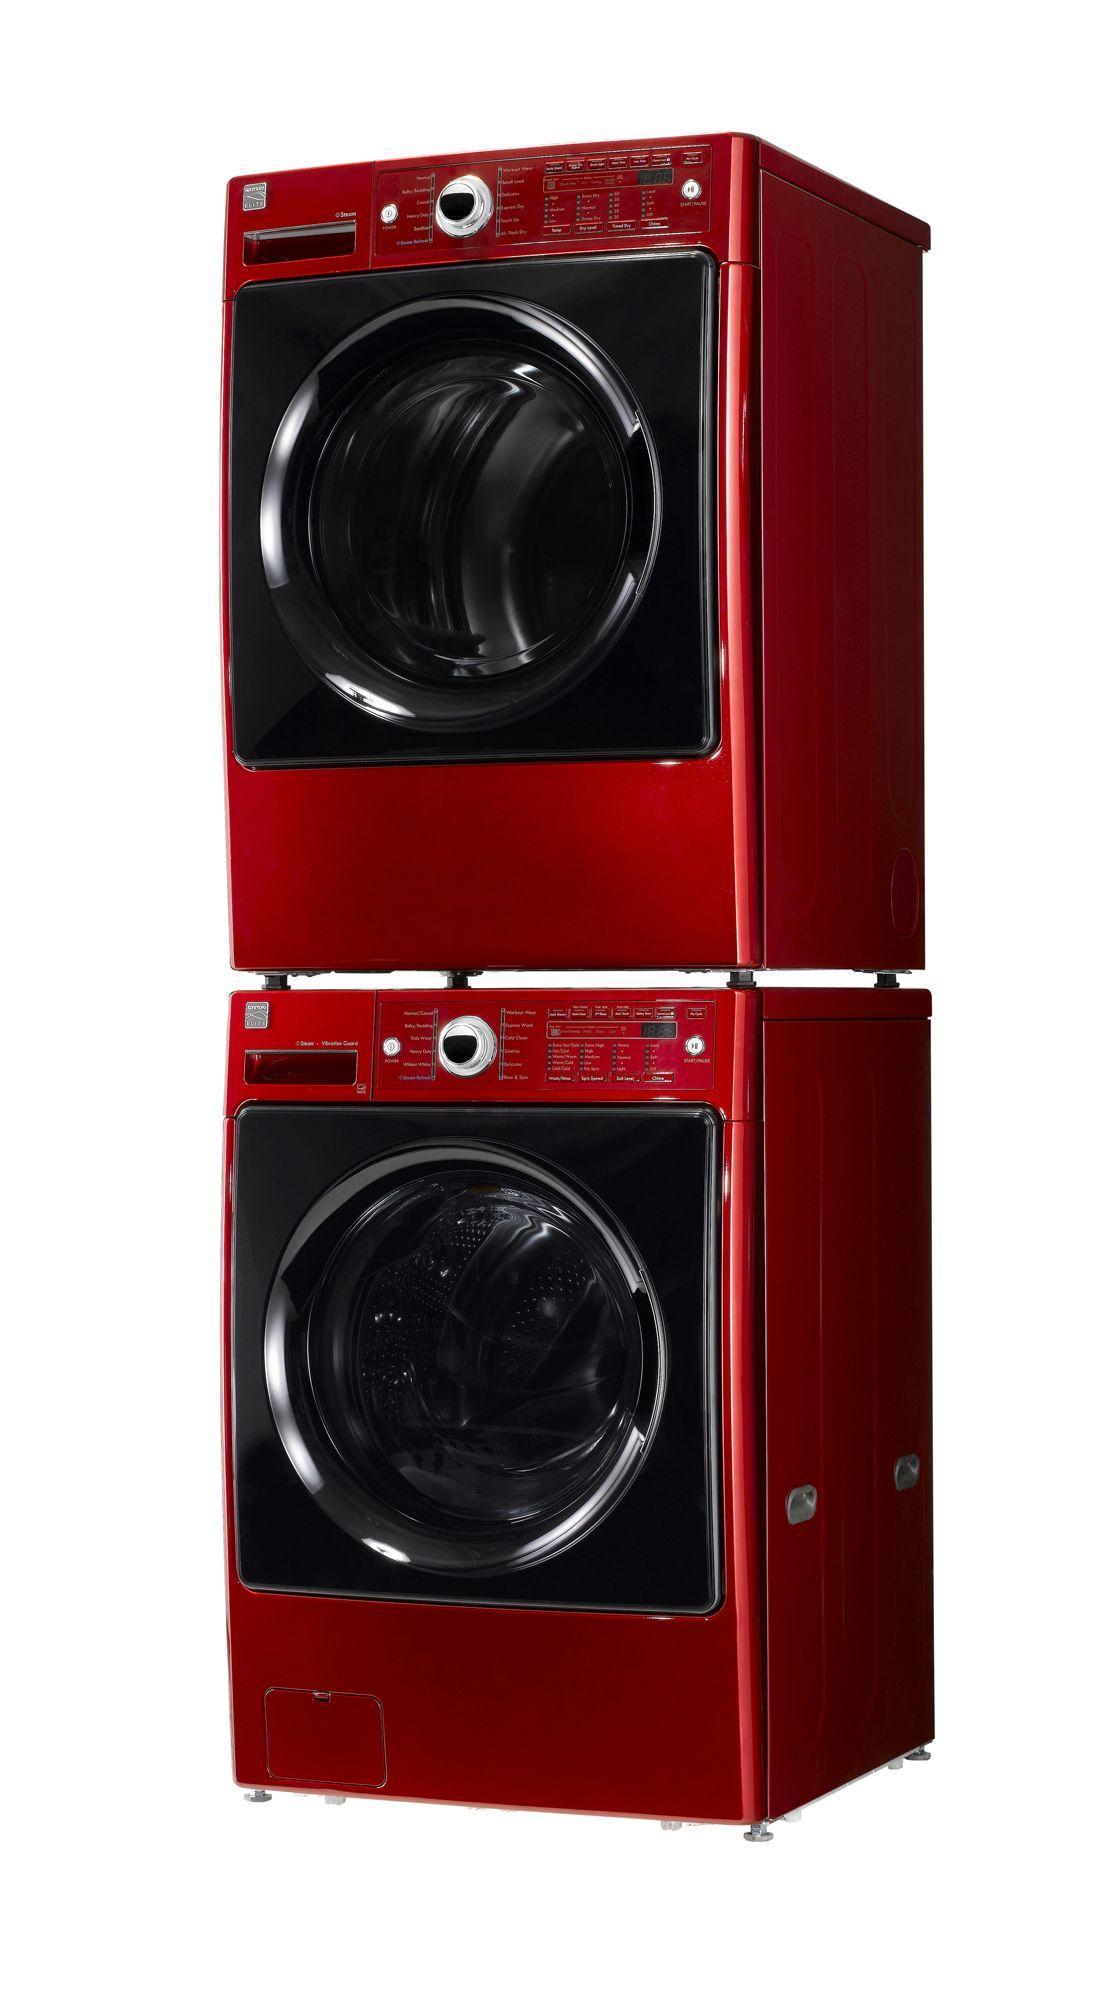 Kenmore Elite 7.4 cu. ft. Electric Steam Dryer - Red